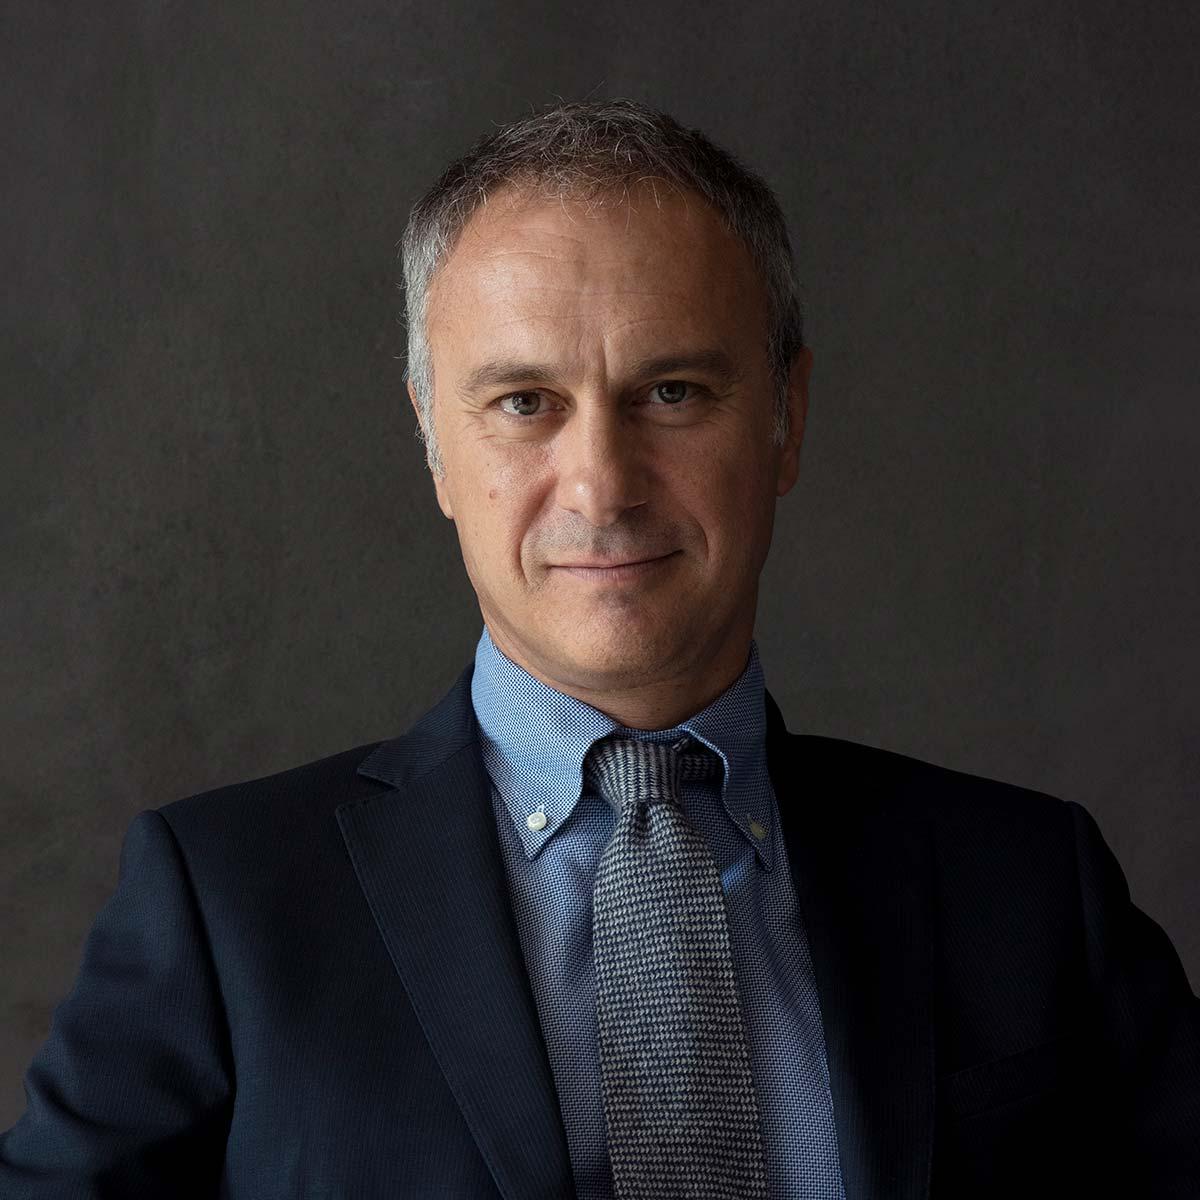 Gilberto Negrini, CEO of B&B Italia